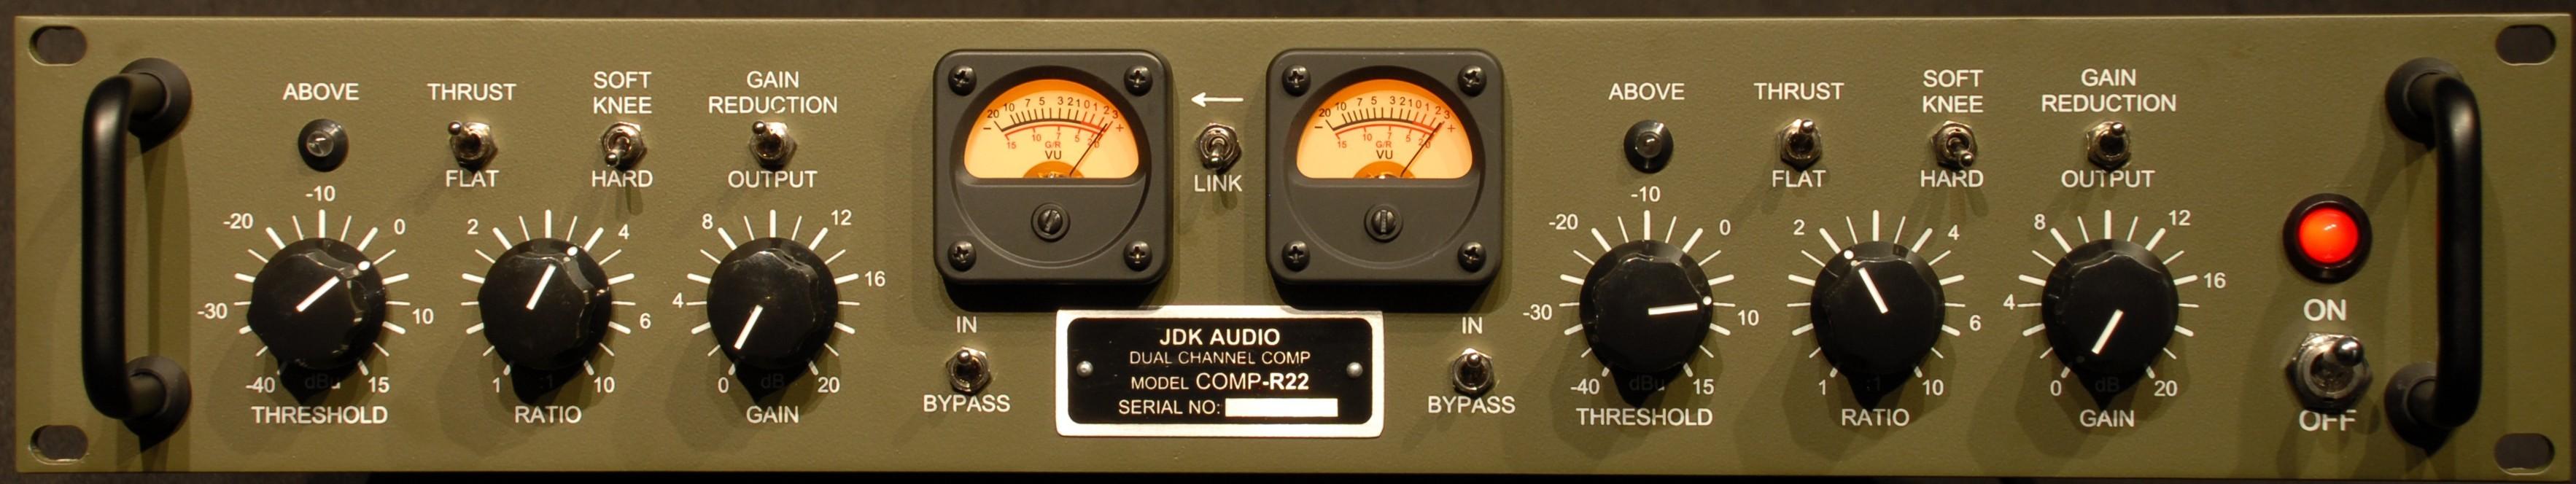 JDK Audio R22 - 2 Channel Compressor